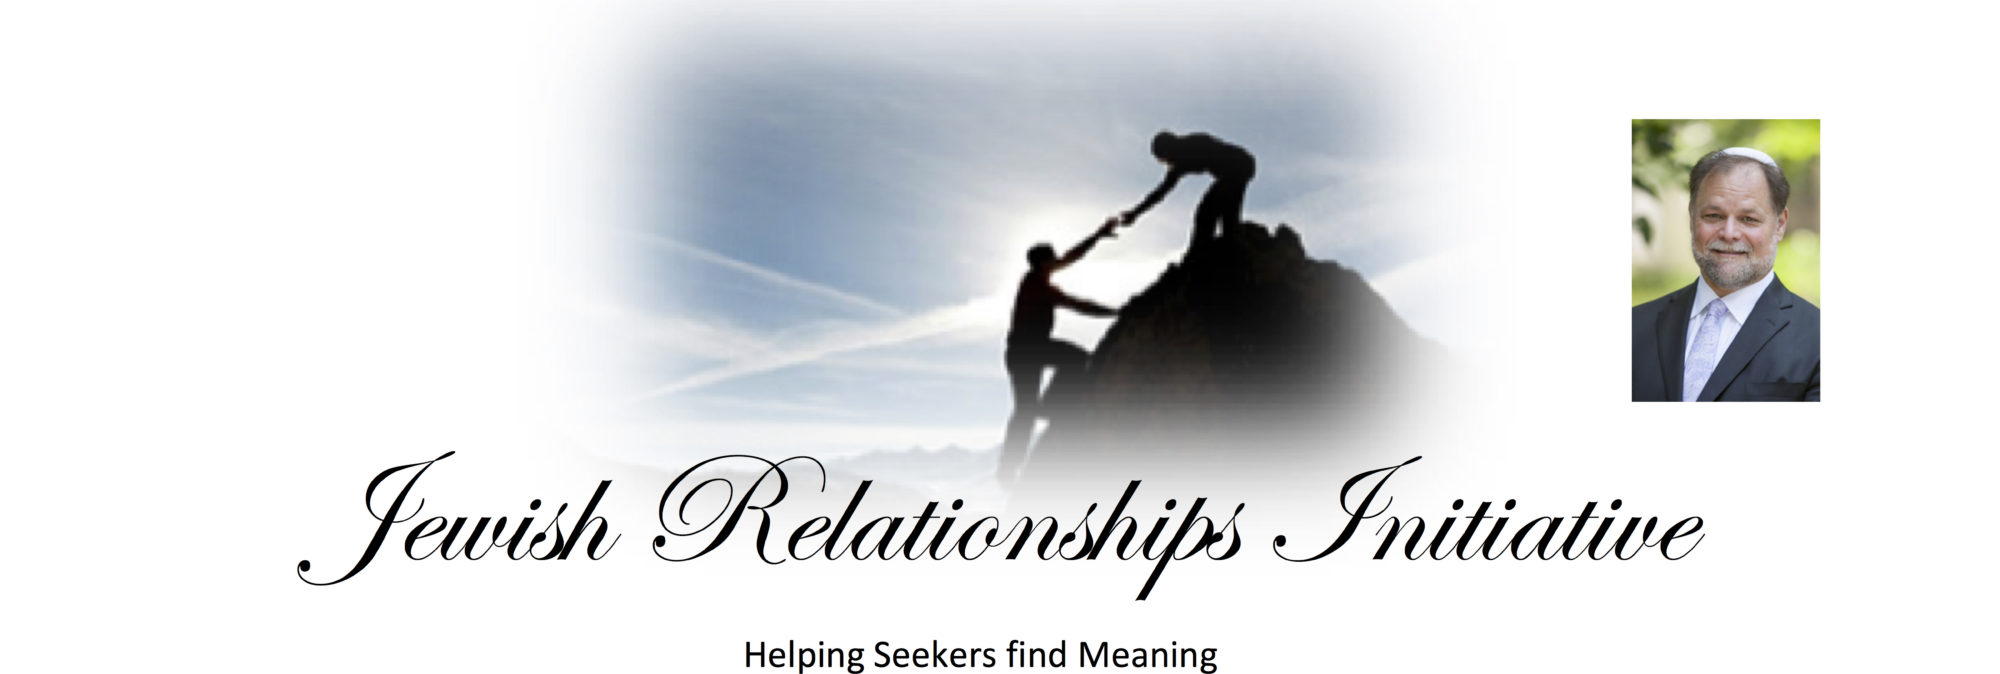 Jewish Relationships Initiative